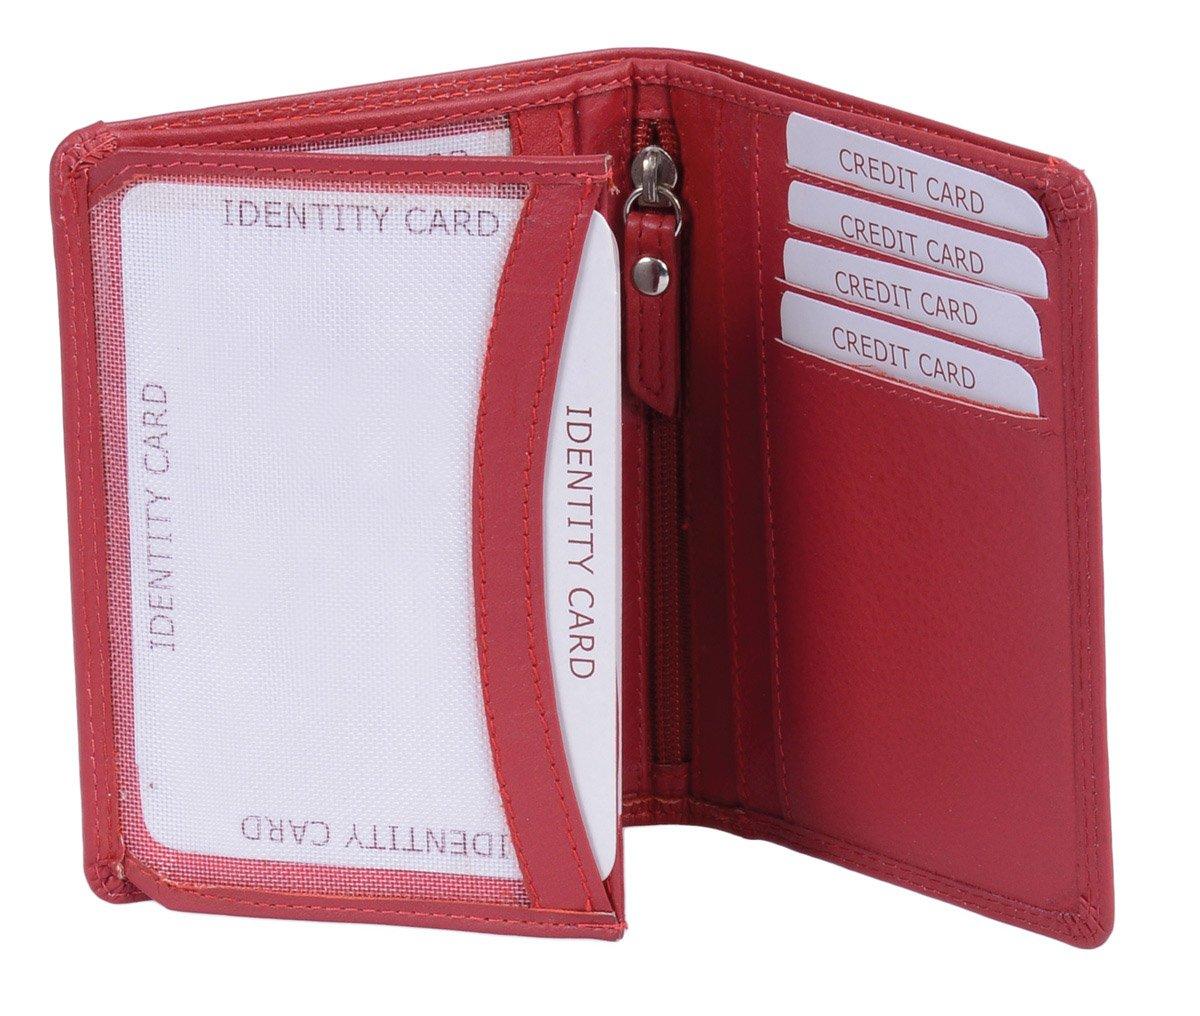 LEAS Ausweishülle, Ausweismappe Echt-Leder, rot Card-Collection'' LEAS Ausweishülle LE2102-01-13